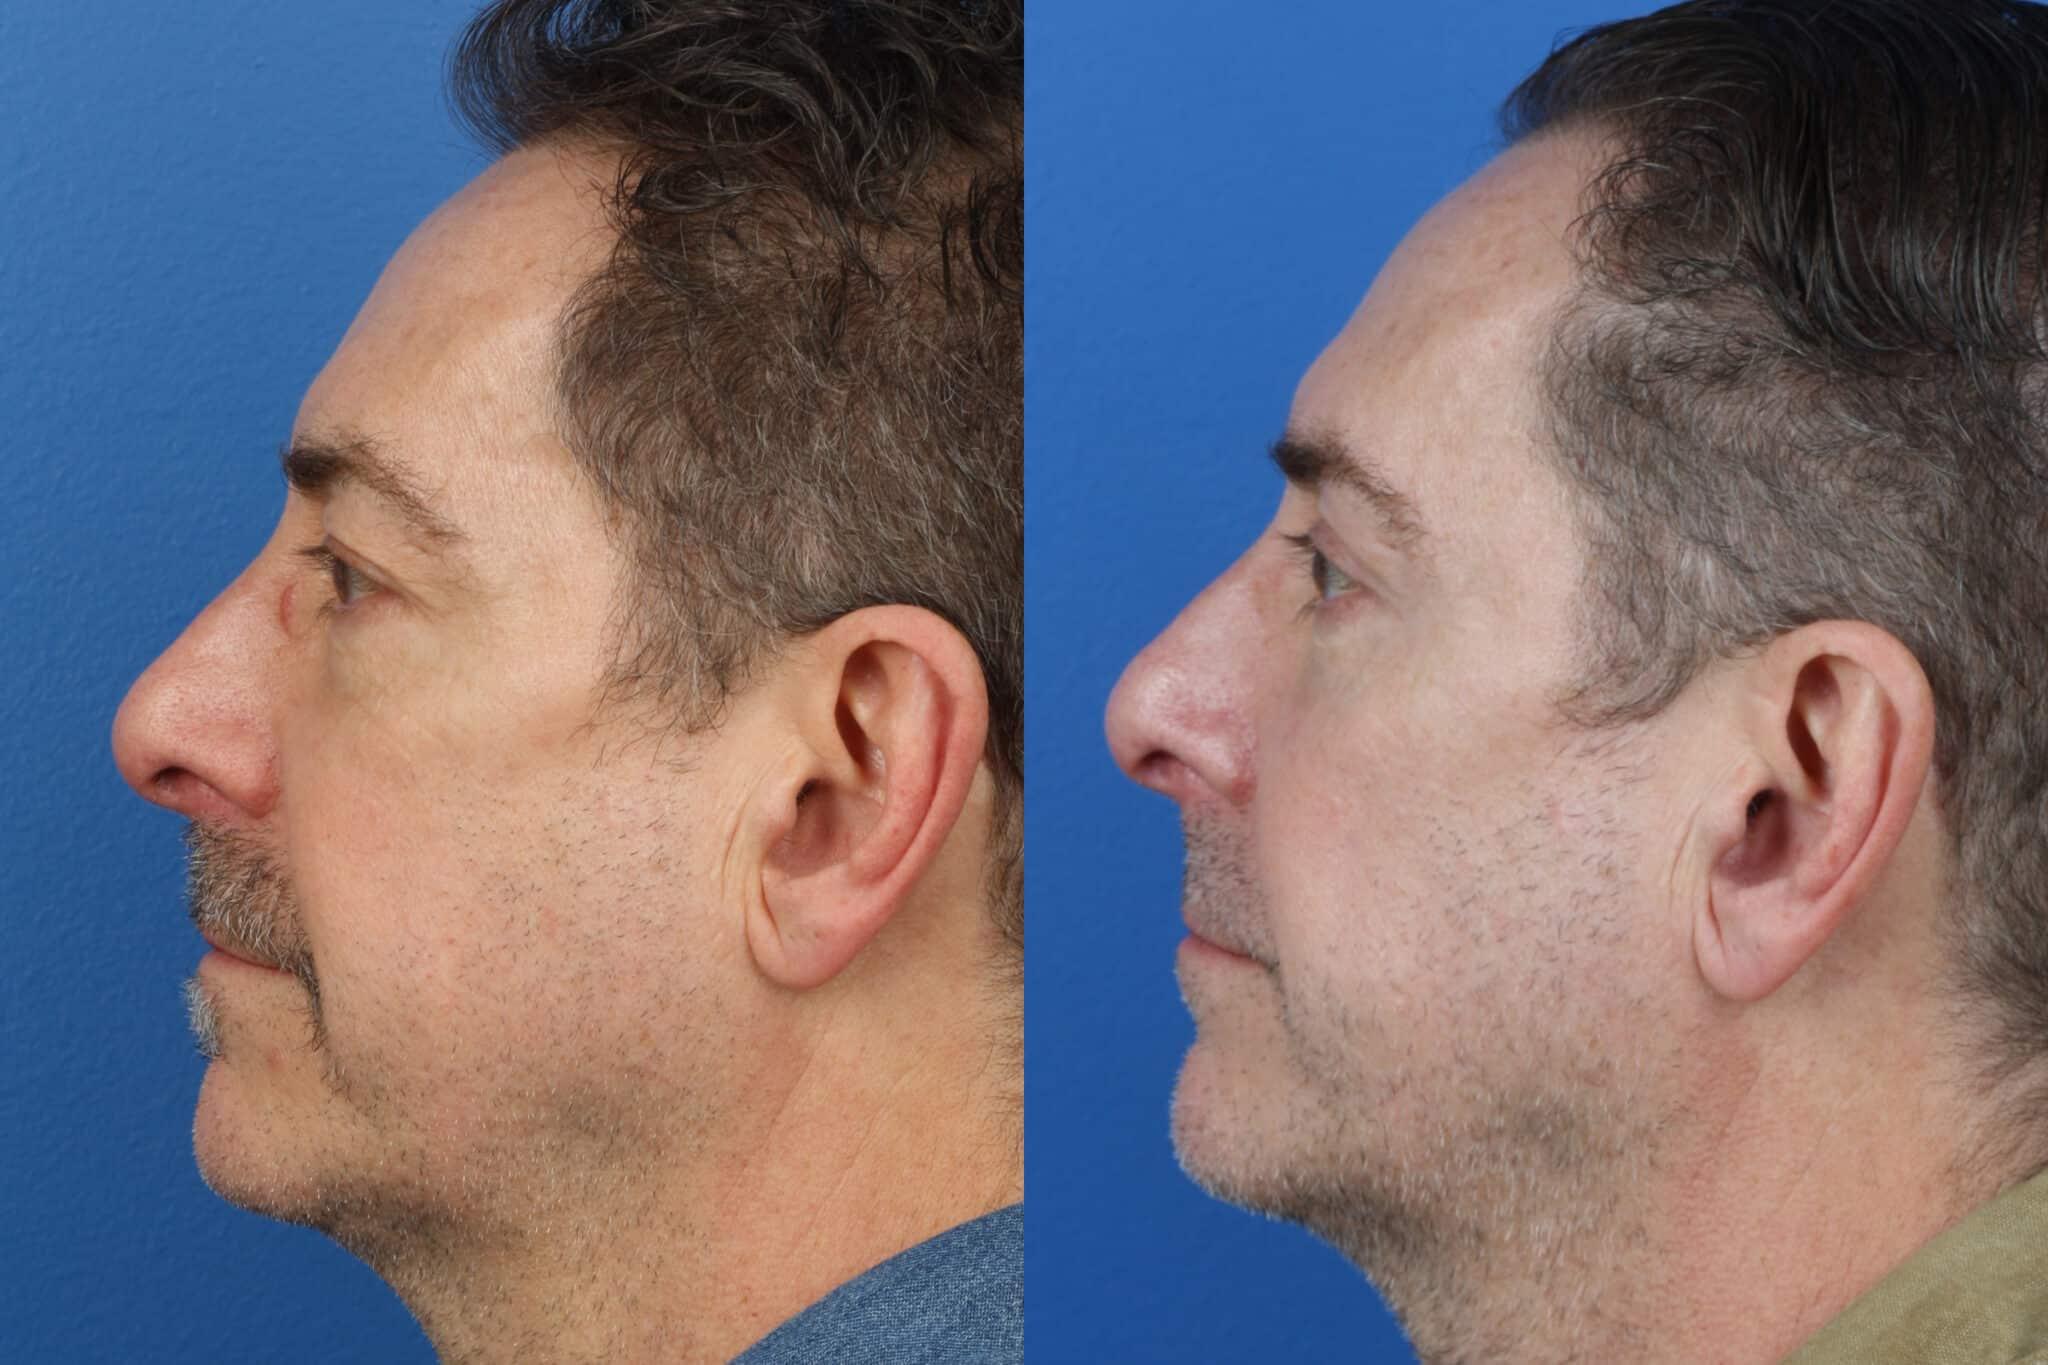 Upper and Lower Blepharoplasty to Rejuvenate the Eyes by Dr. Miller